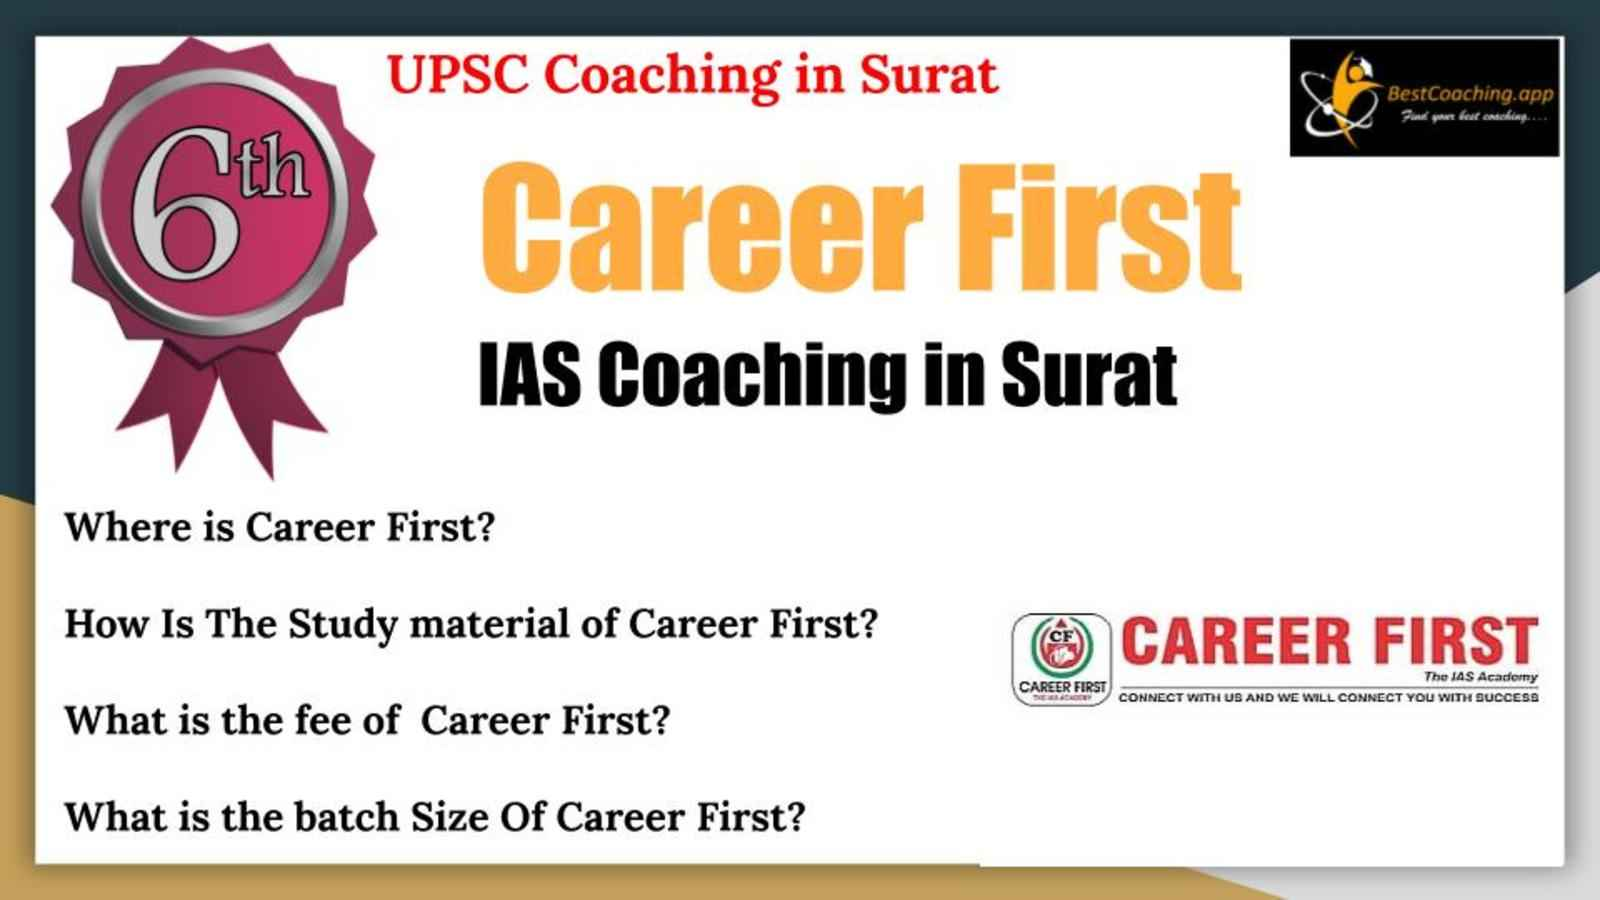 UPSC Coaching in Surat